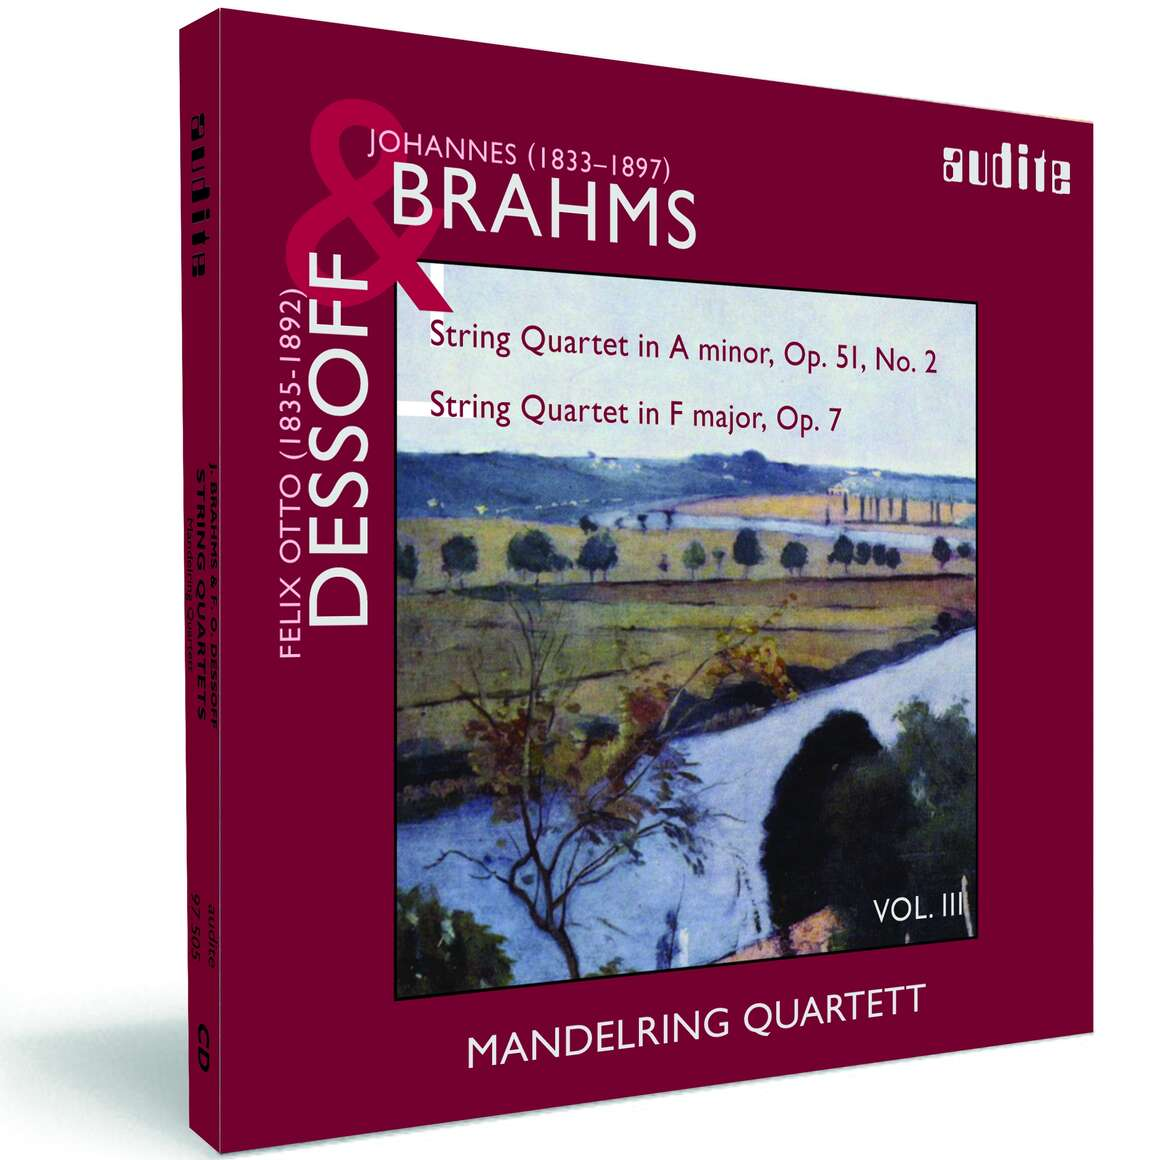 String Quartets by Brahms (Op. 51, No. 2) & Dessoff (Op. 7)